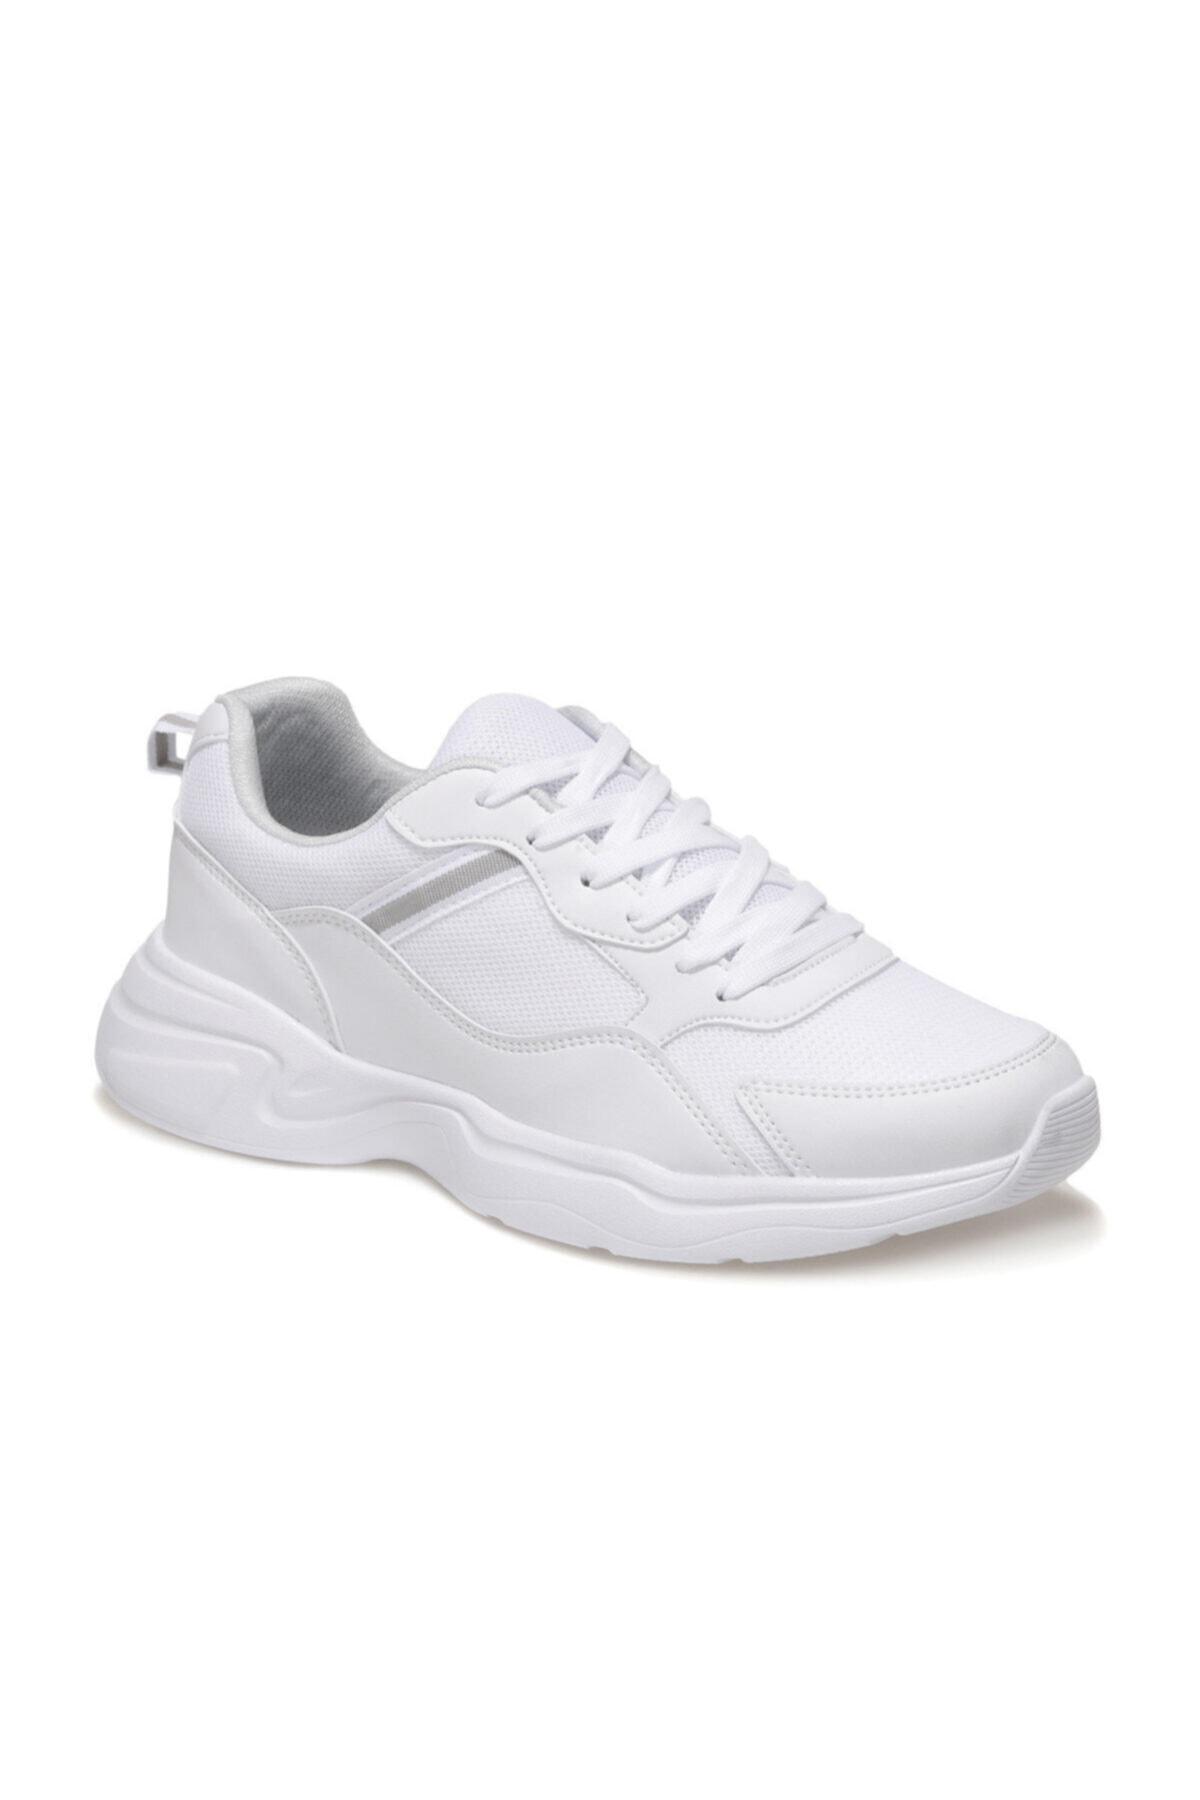 Torex MATEO 1FX Beyaz Erkek Sneaker Ayakkabı 101018315 1